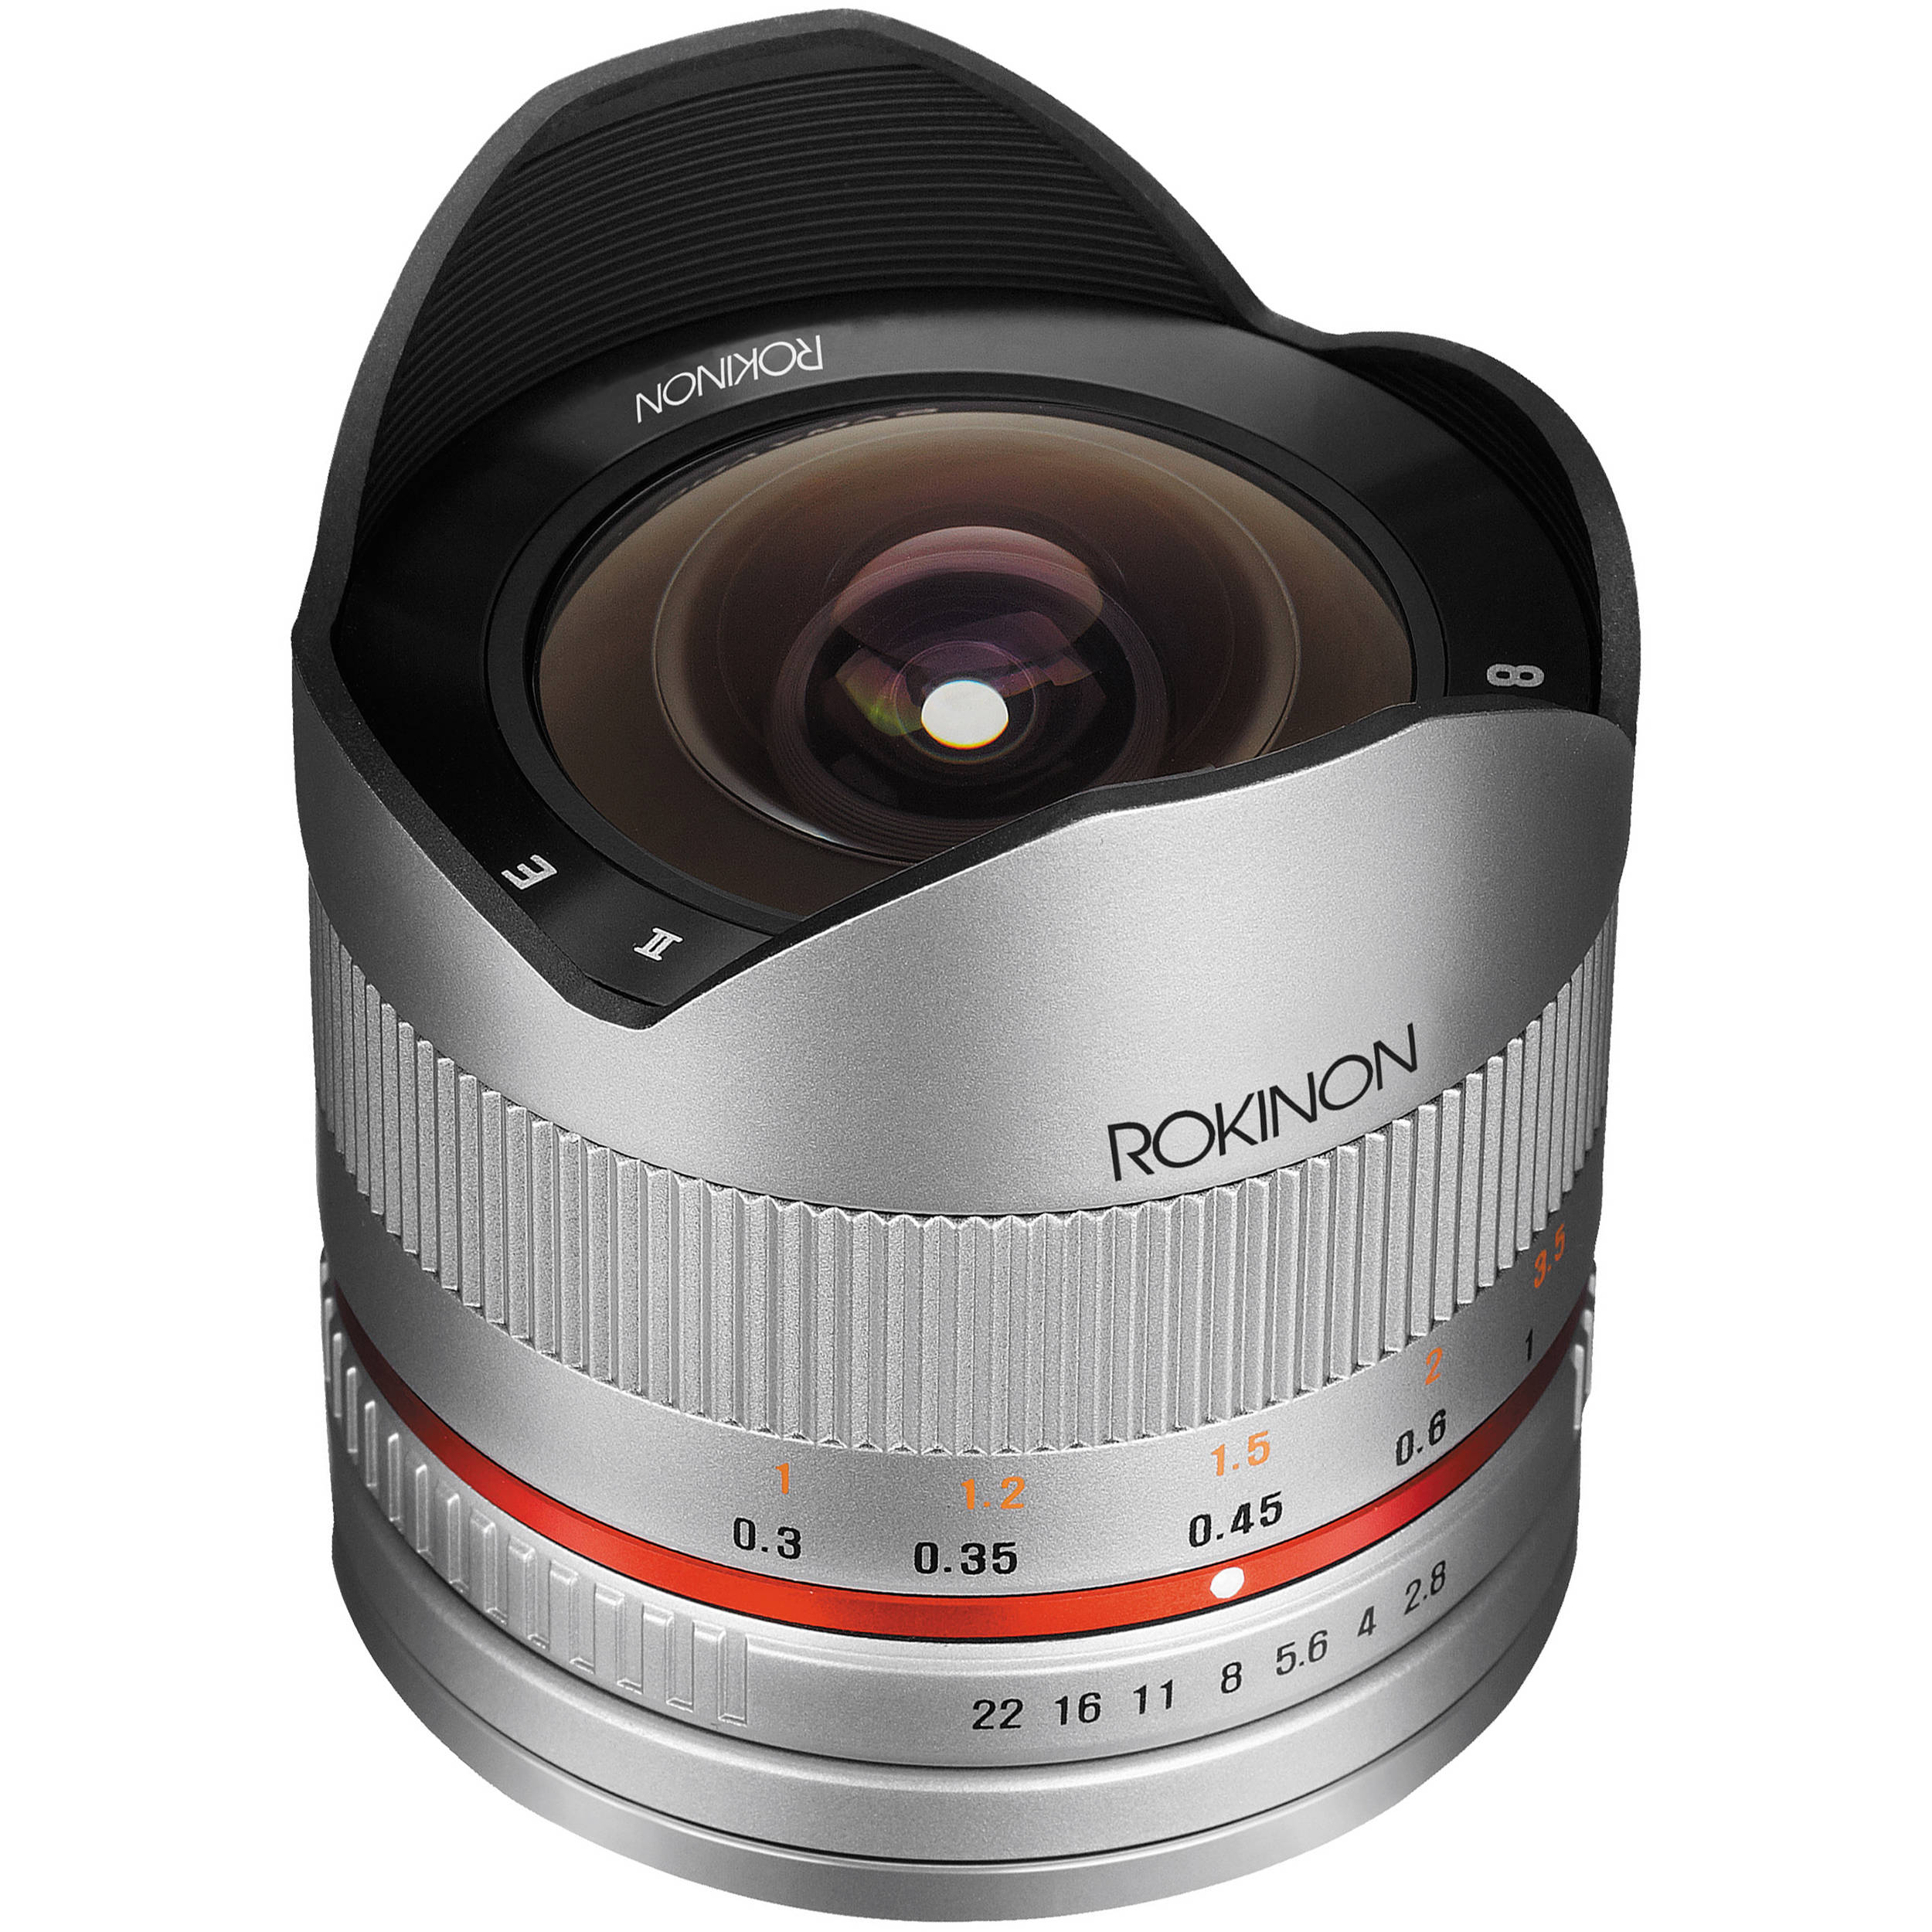 Amcrest 32CH 4MP Security Camera System w/ 4K NVR, Black 3.6mm Angle Lens  16 Hard Drive Not Included x 4-Megapixel IP67 Weatherproof Bullet WiFi IP  Cameras NV4432-HS-IP4M-1026B16 sareg.com